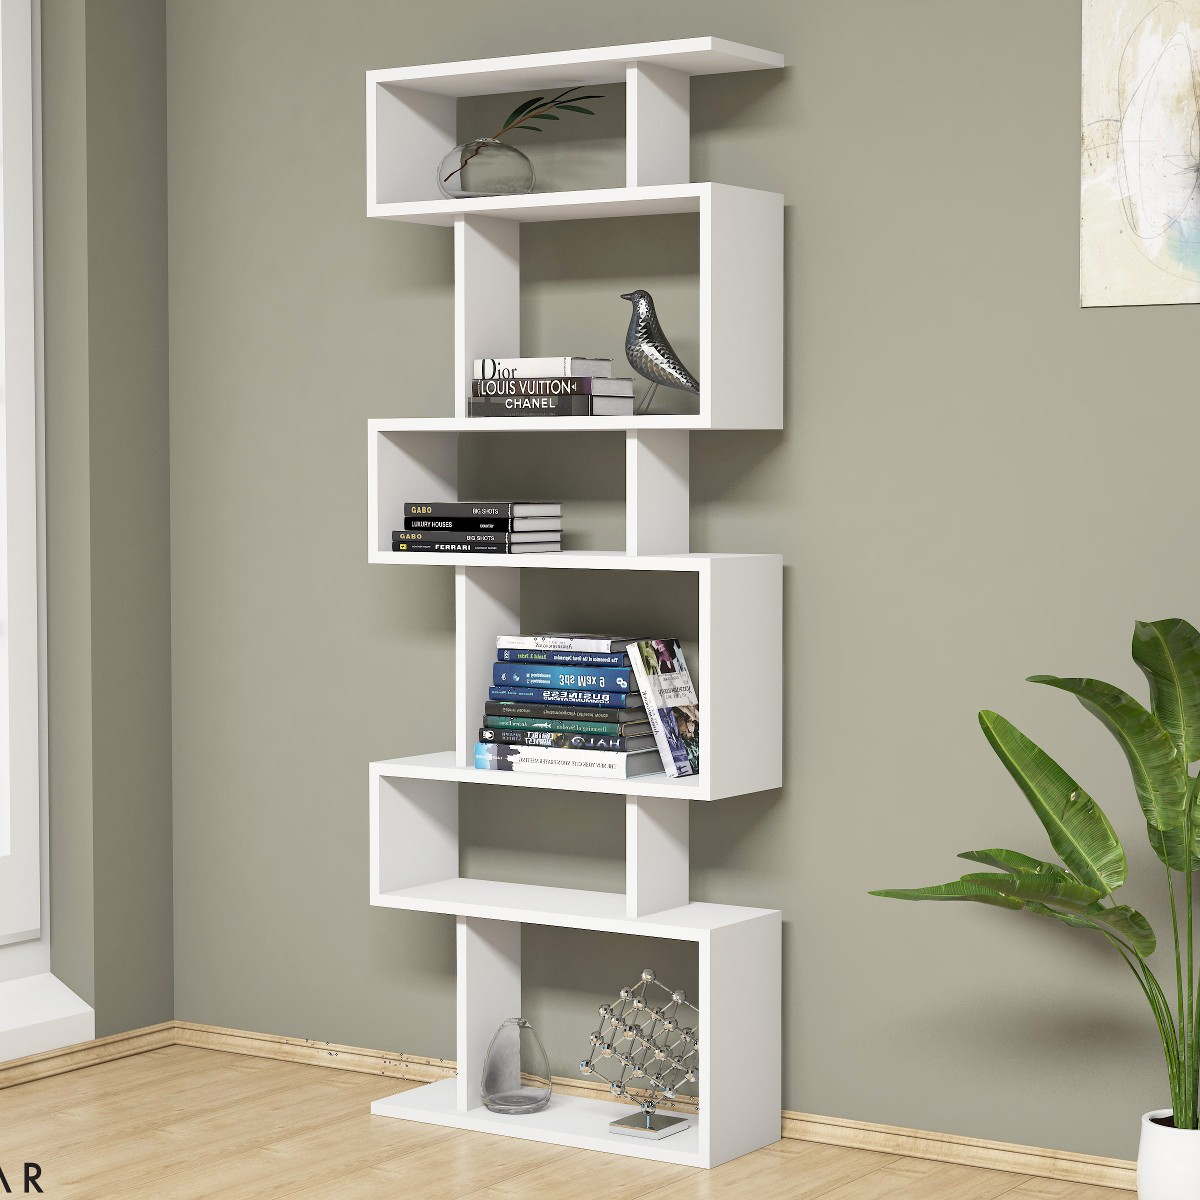 Floyd libreria verticale a giorno design moderno 60 x 150 cm for Librerie in legno moderne